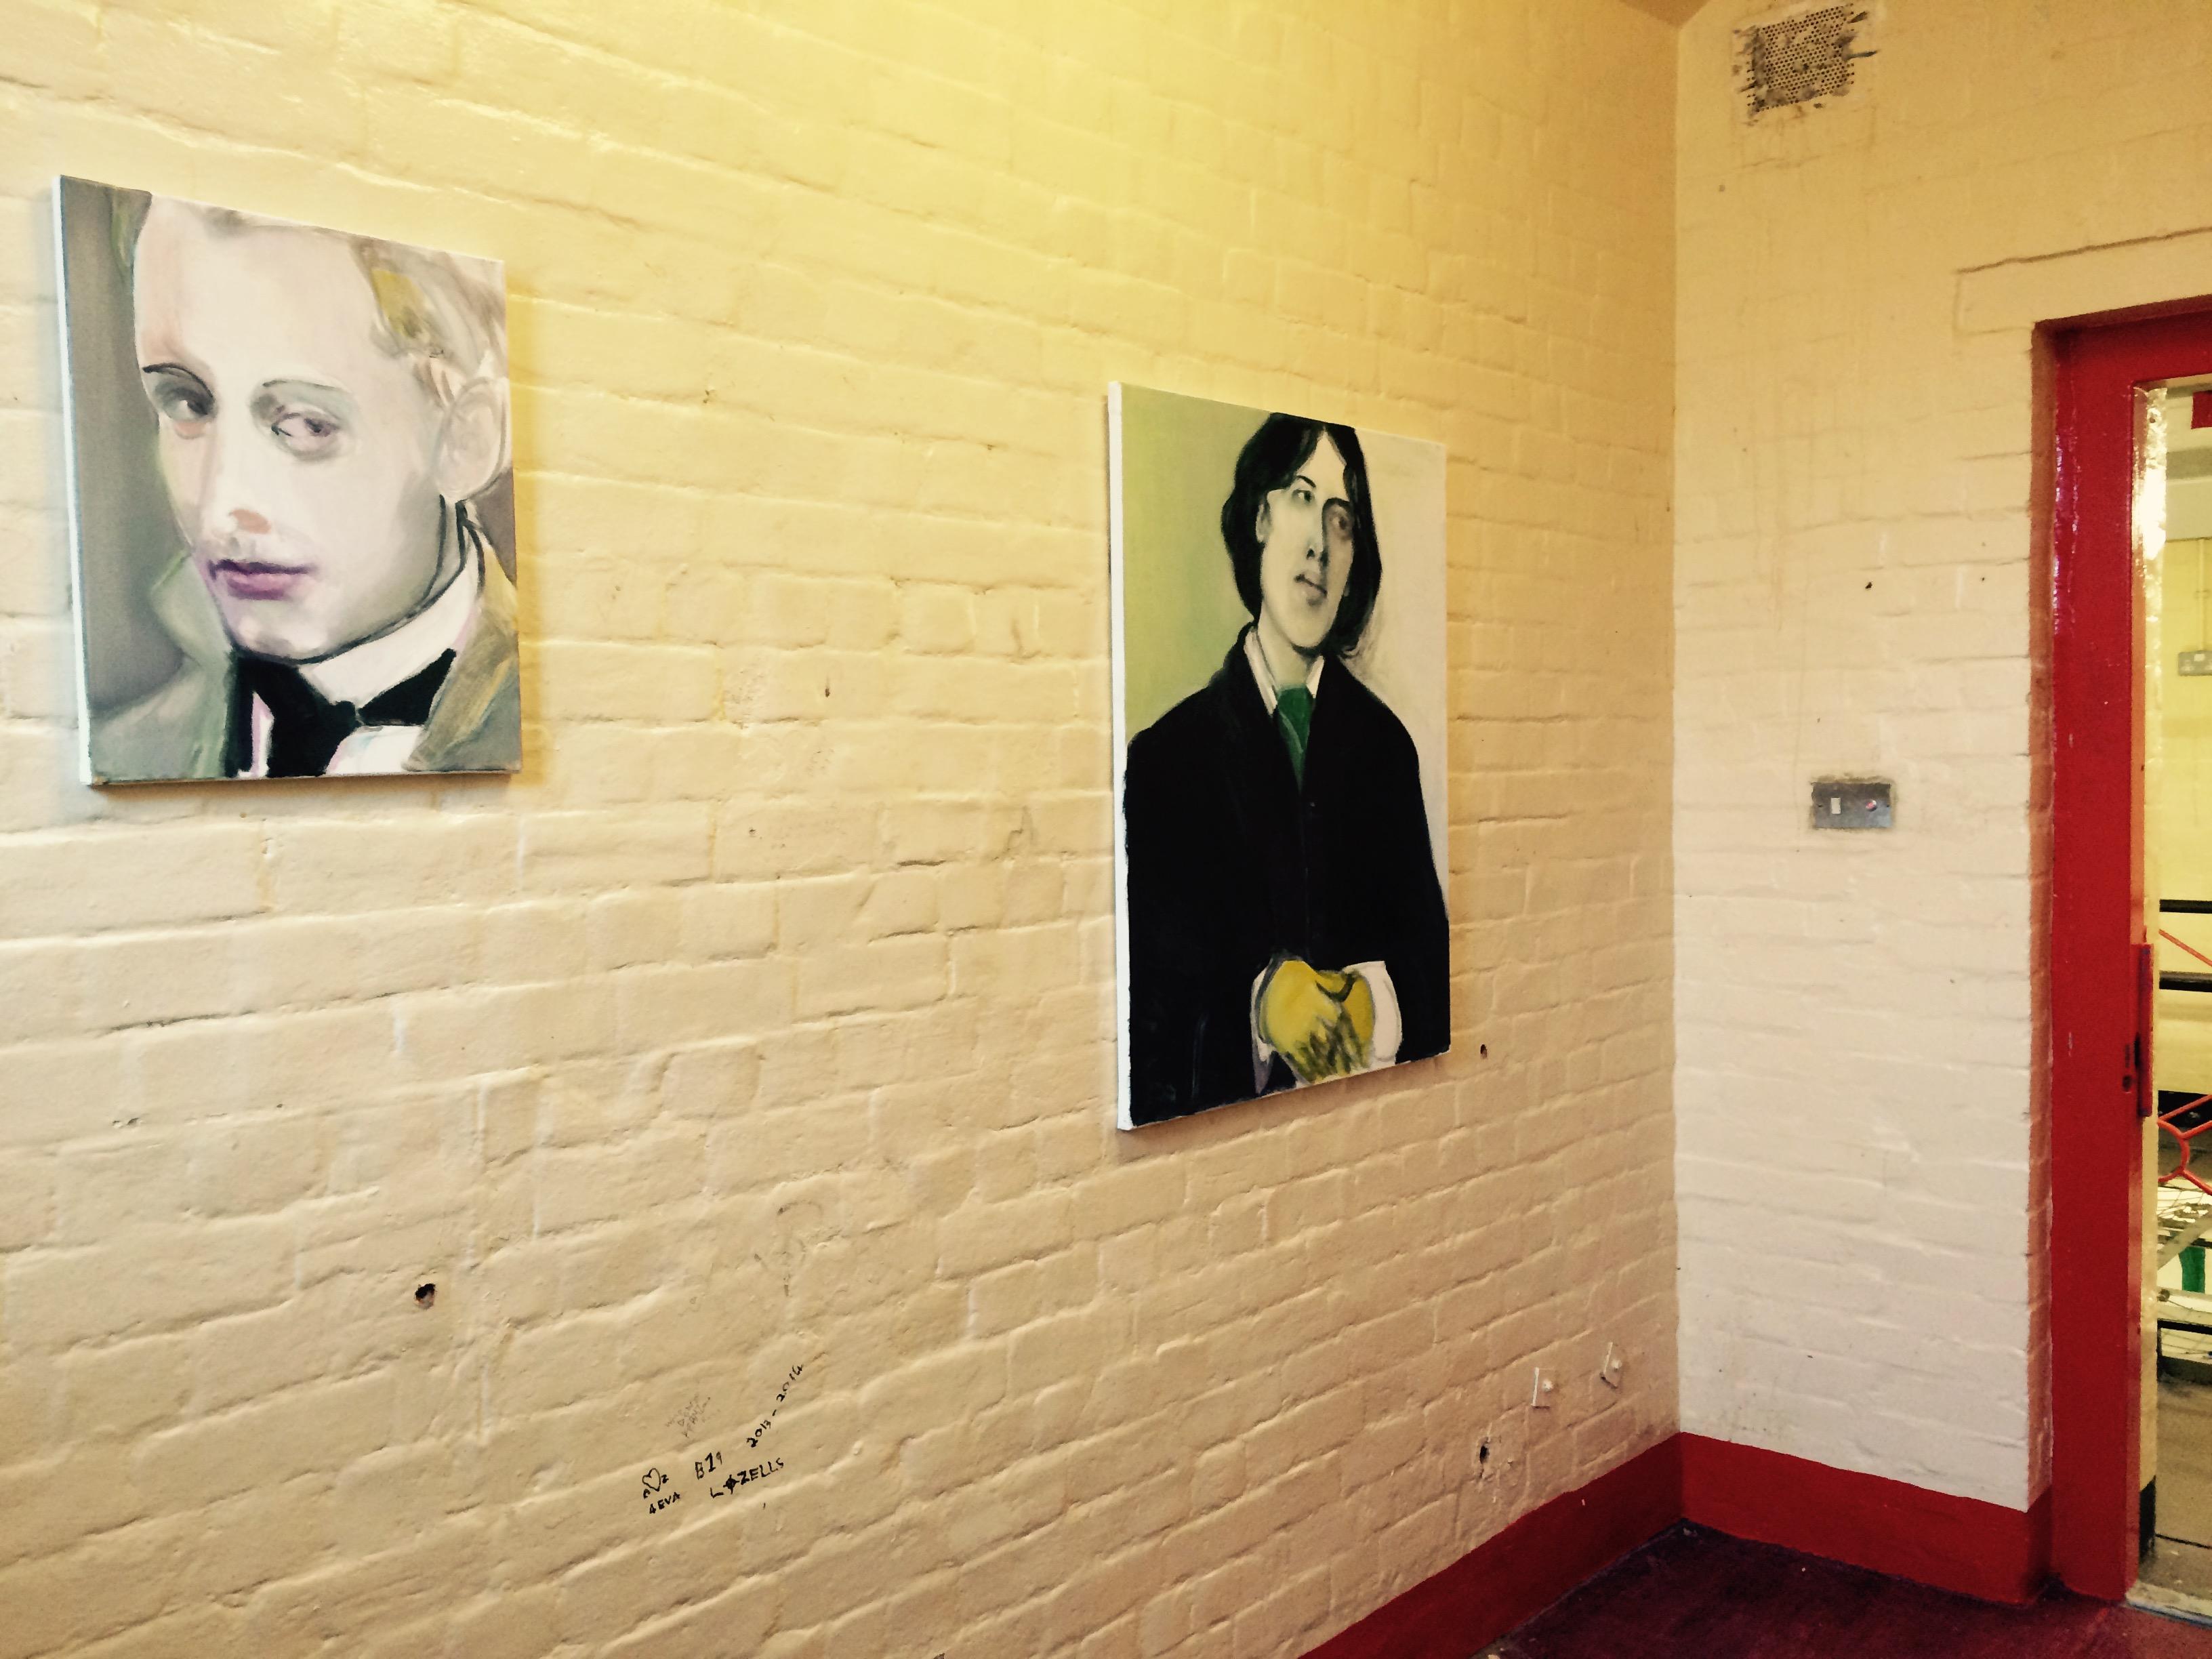 'Lord Alfred Douglas (Bosie)' and 'Oscar Wilde', Marlene Dumas, (2016), Inside: Artists and Writers in Reading Prison ©James Lingwood/Artangel